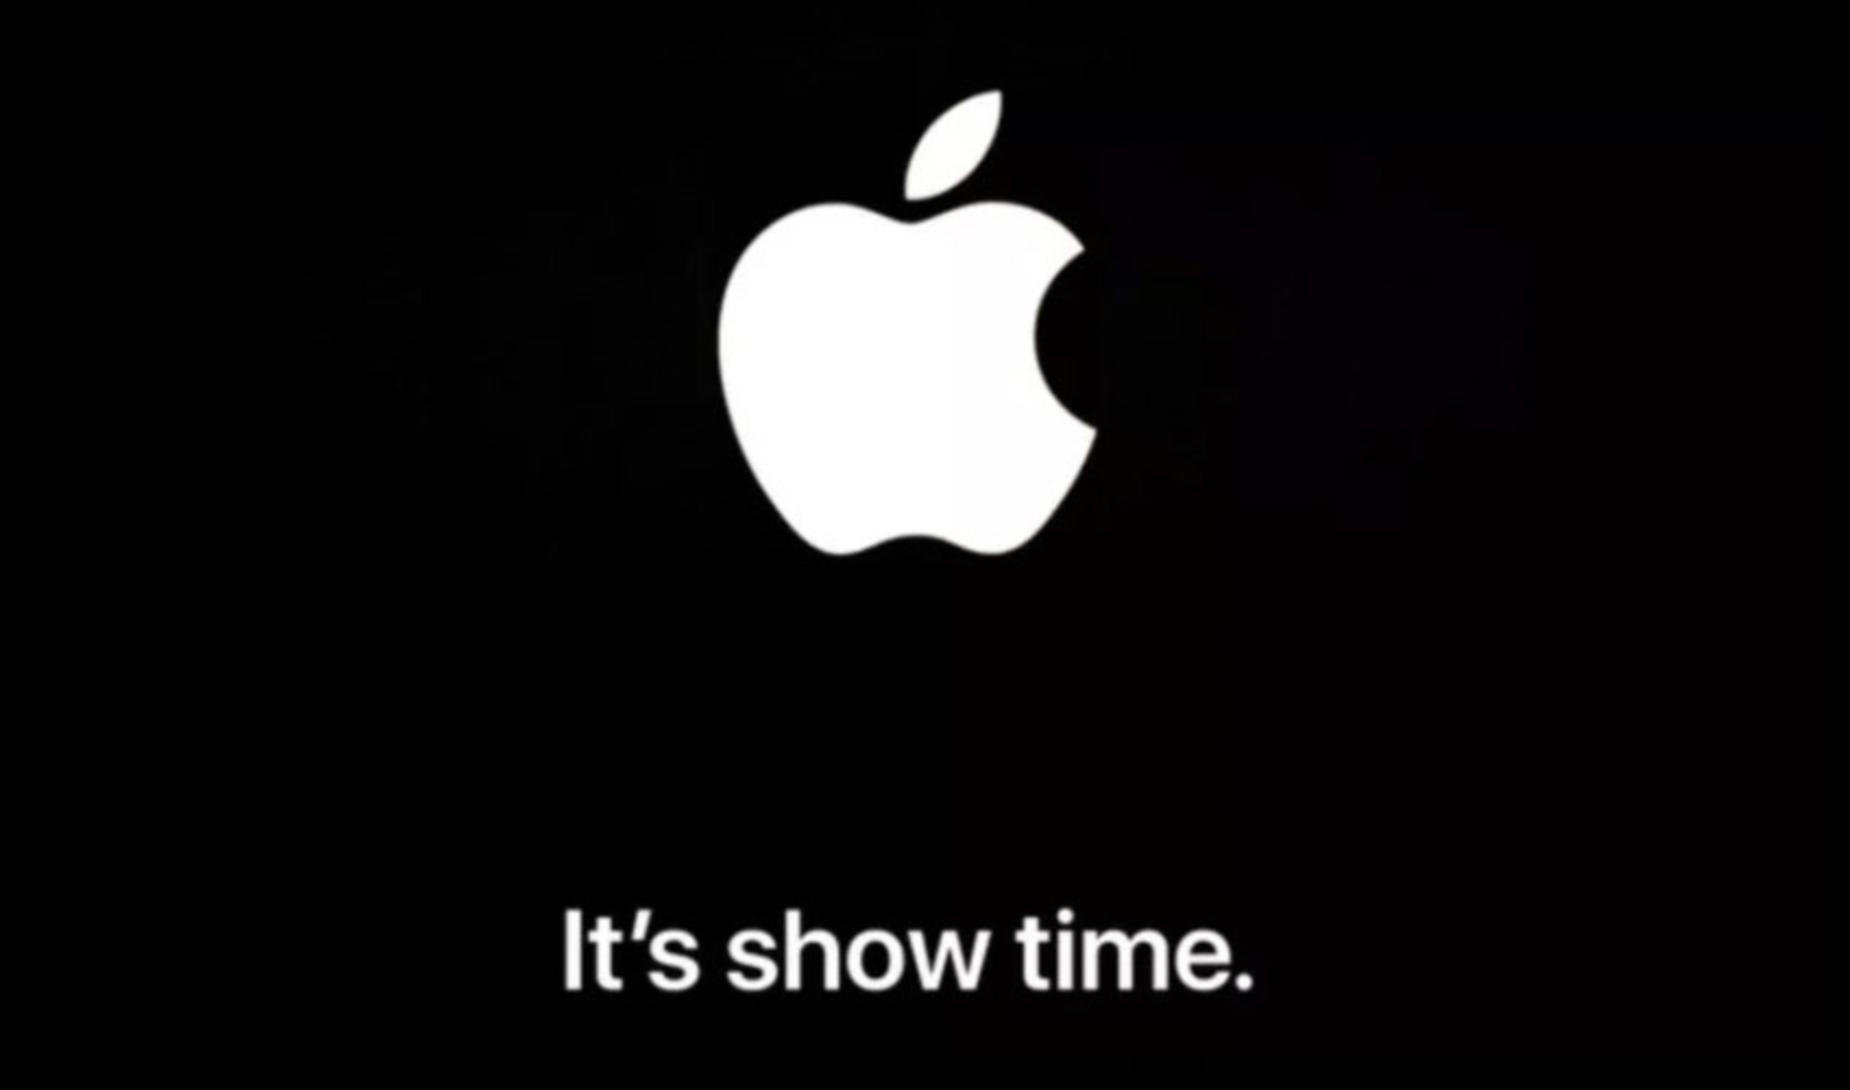 Apple Netflix'e Rakip Oluyor